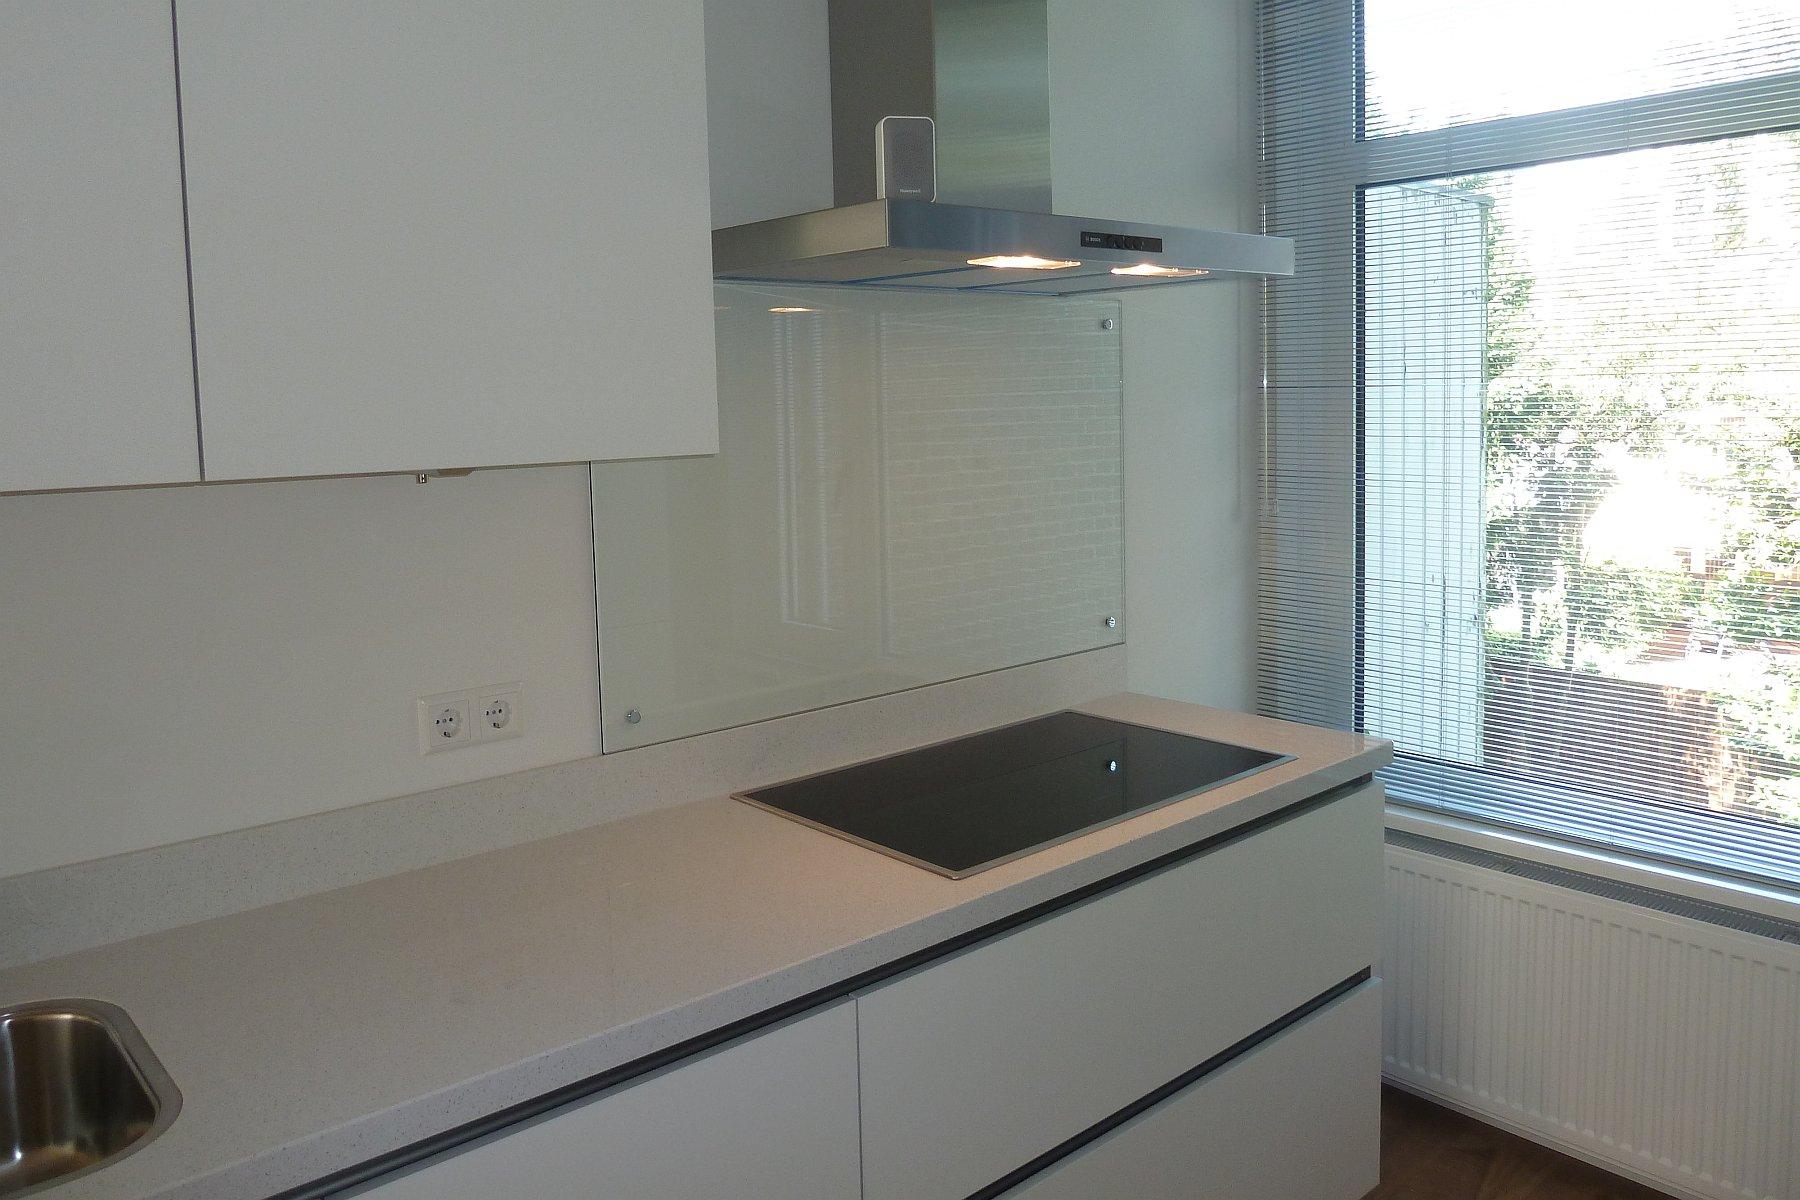 Glazen Spatwand Keuken : Achterwand keuken glas in ral glasbestellen nl decoratie